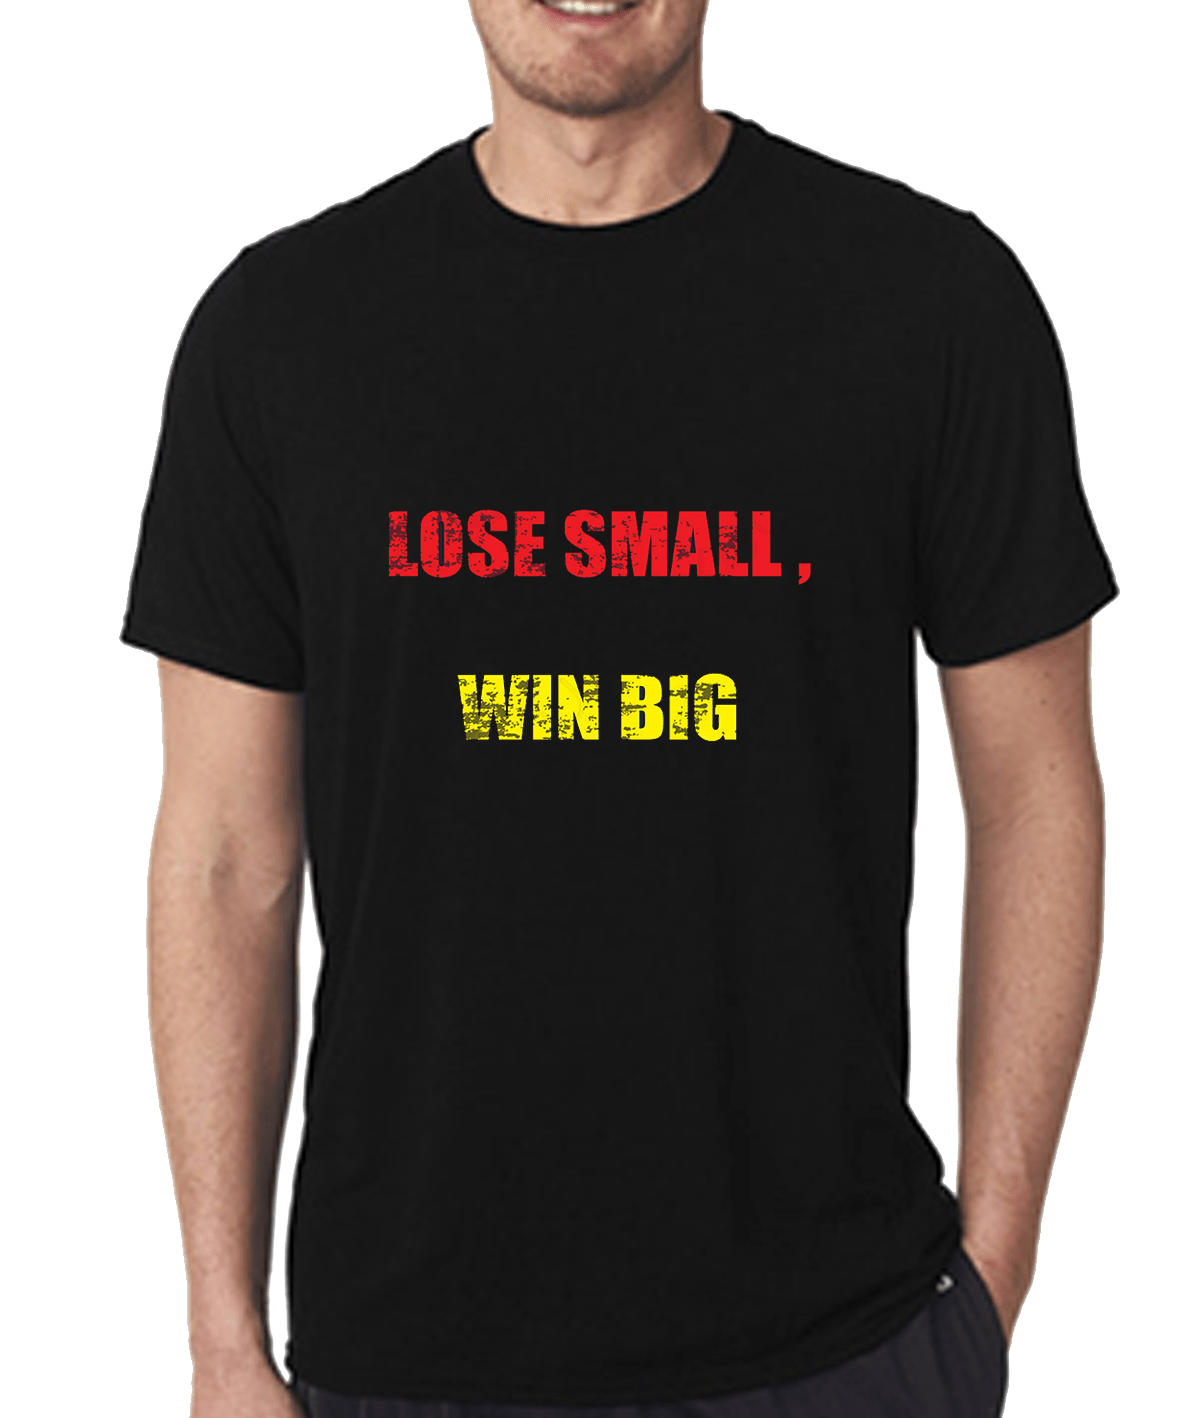 Lose small Win big T-shirt for Men Slider Thumbnail 1/2